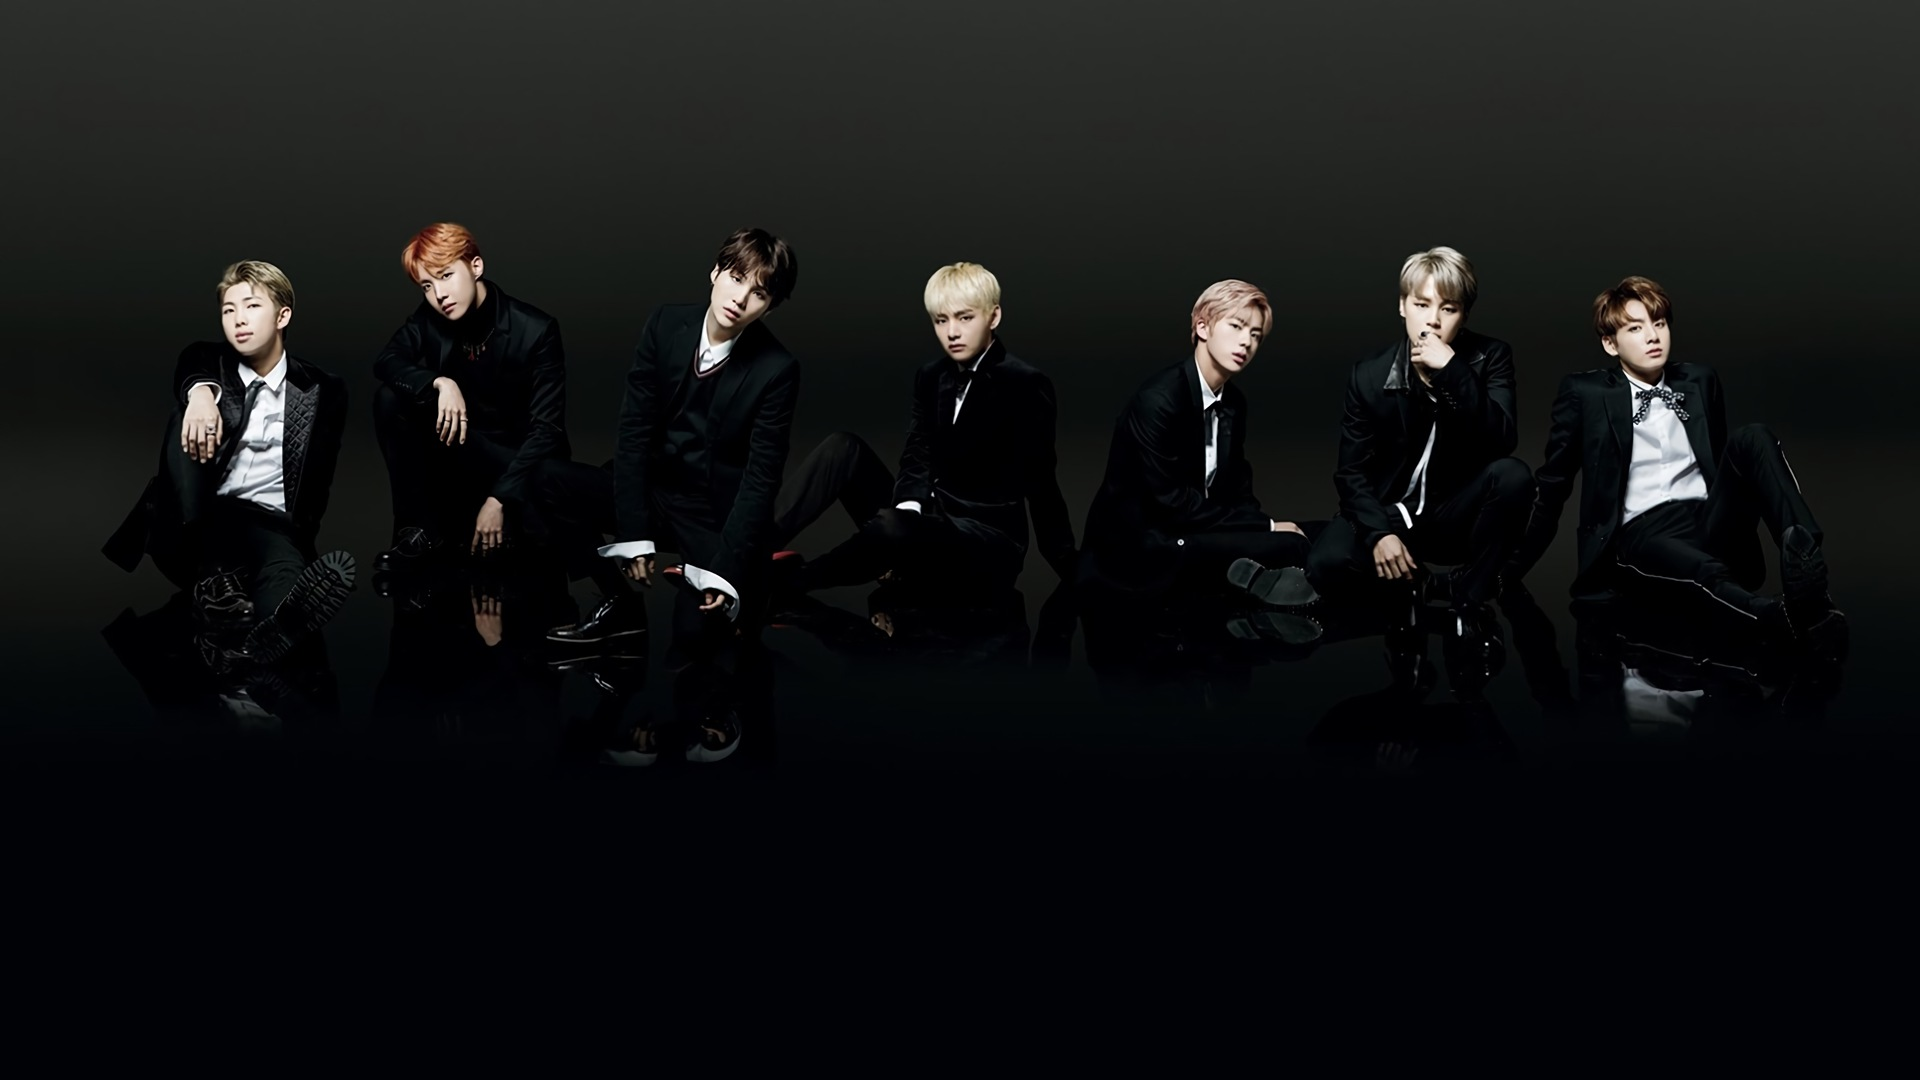 Bts K pop Members Hd Wallpaper Black Bts Wallpaper Desktop